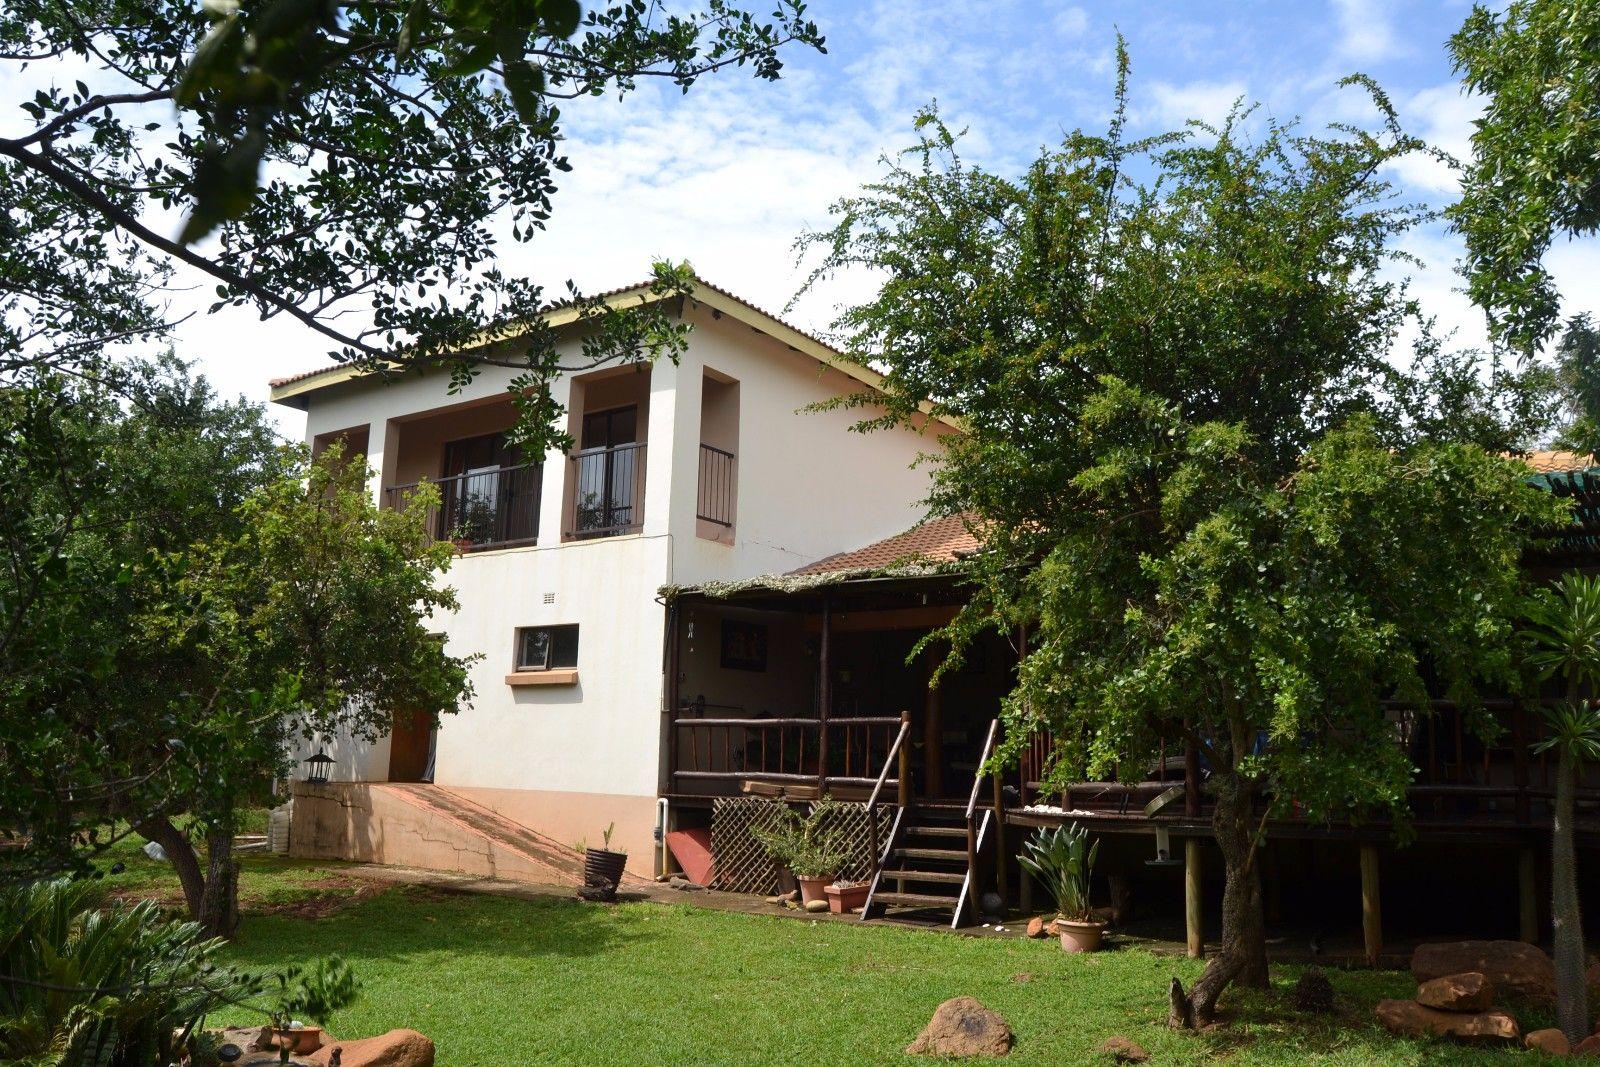 Hoedspruit, Kampersrus Property  | Houses For Sale Kampersrus, KAMPERSRUS, House 3 bedrooms property for sale Price:1,950,000